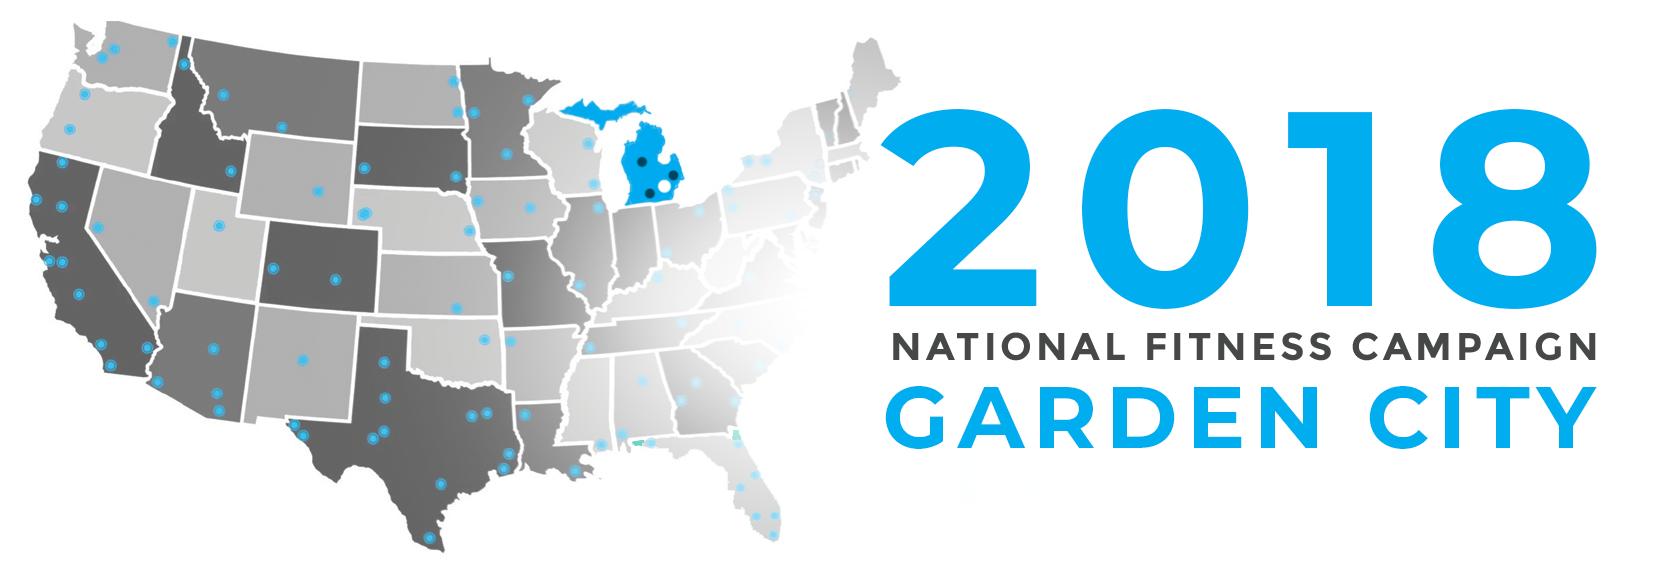 2018 Campaign Logo Garden City.png